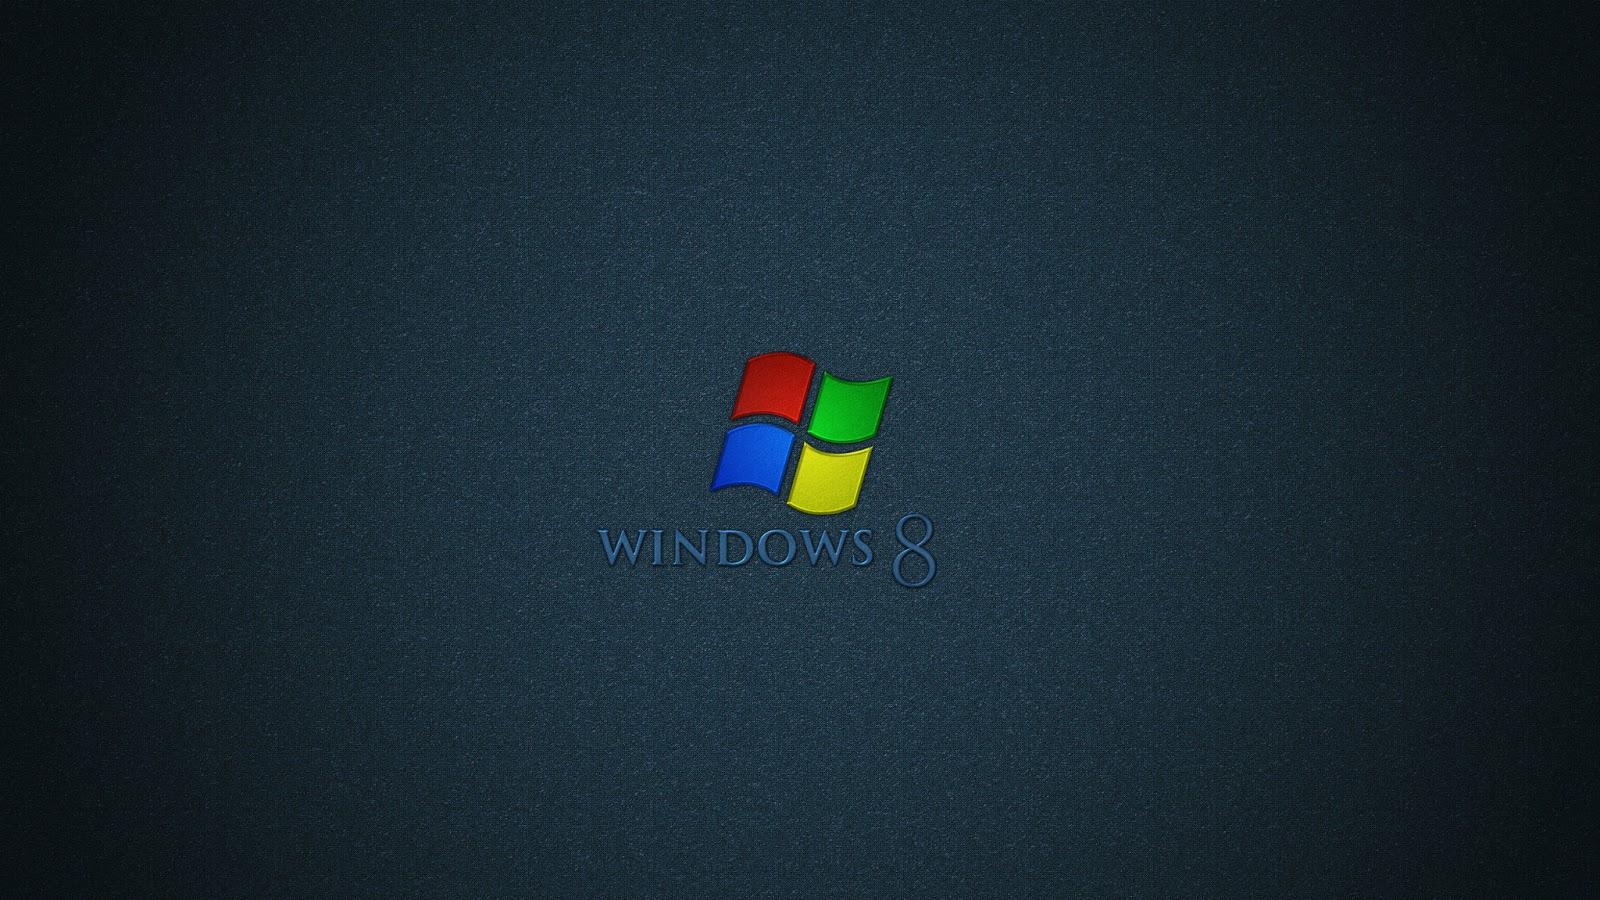 Wallpaper Hd Keren Untuk Windows 7